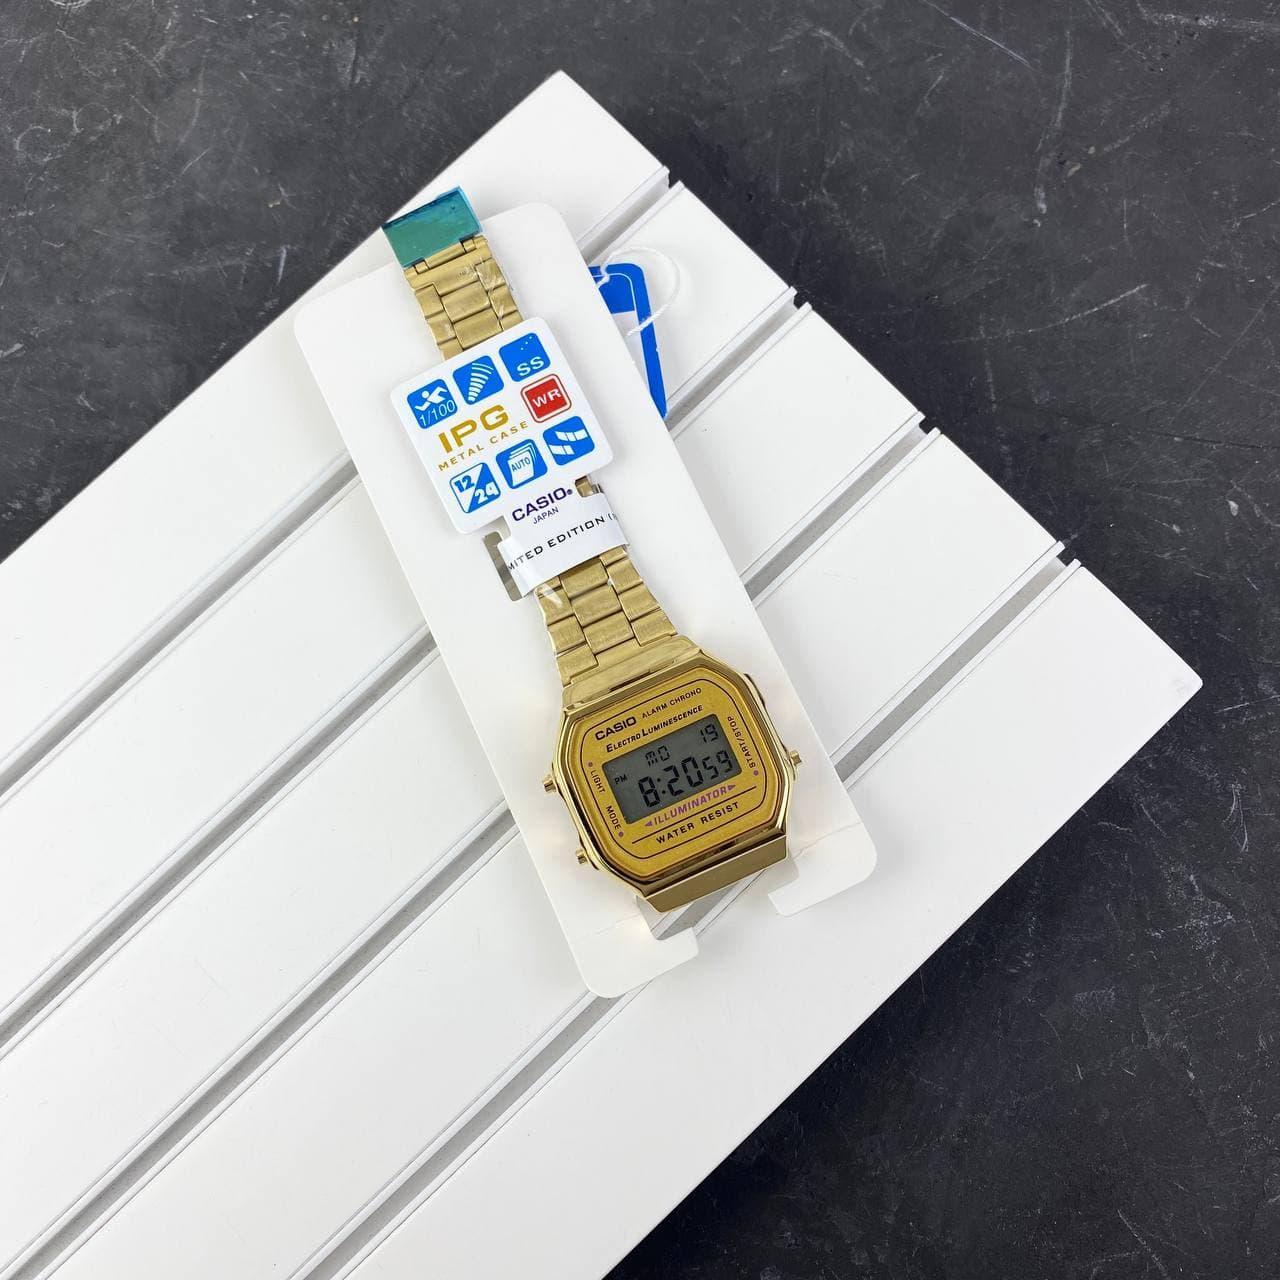 Мужские наручные часы Casio Illuminator F-91W Gold New